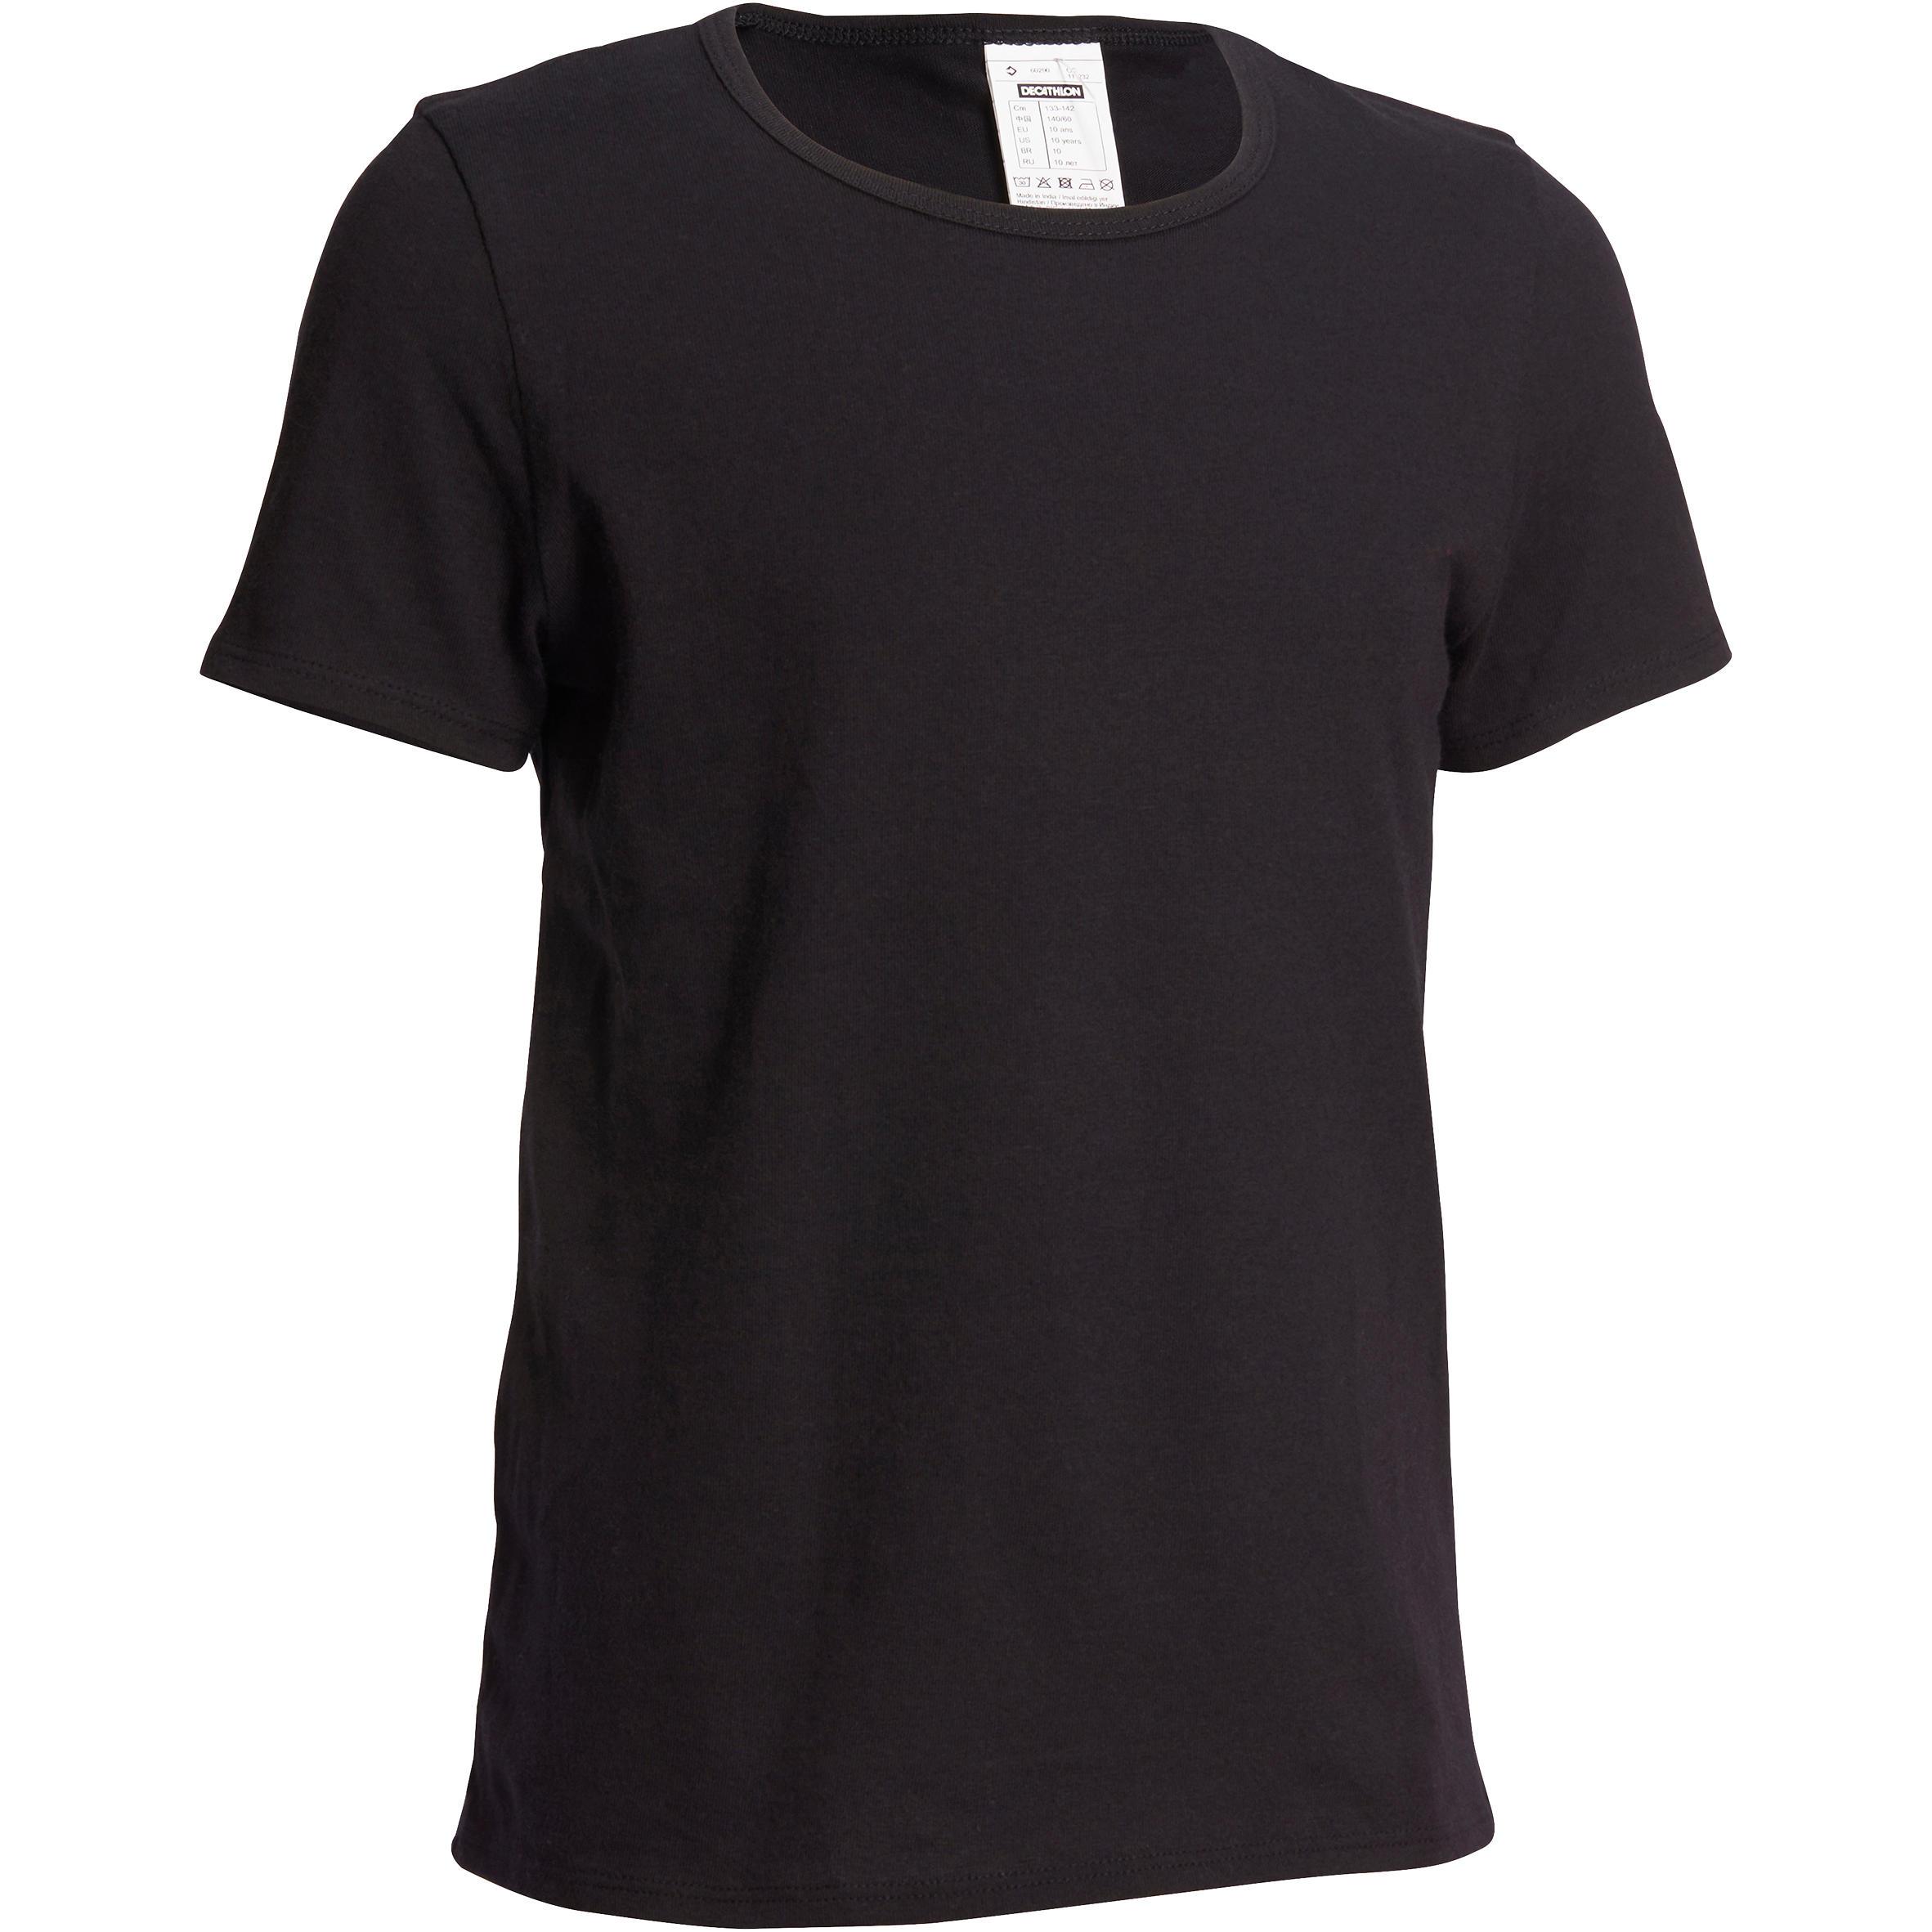 Boys' Gym Short-Sleeved T-Shirt - Black